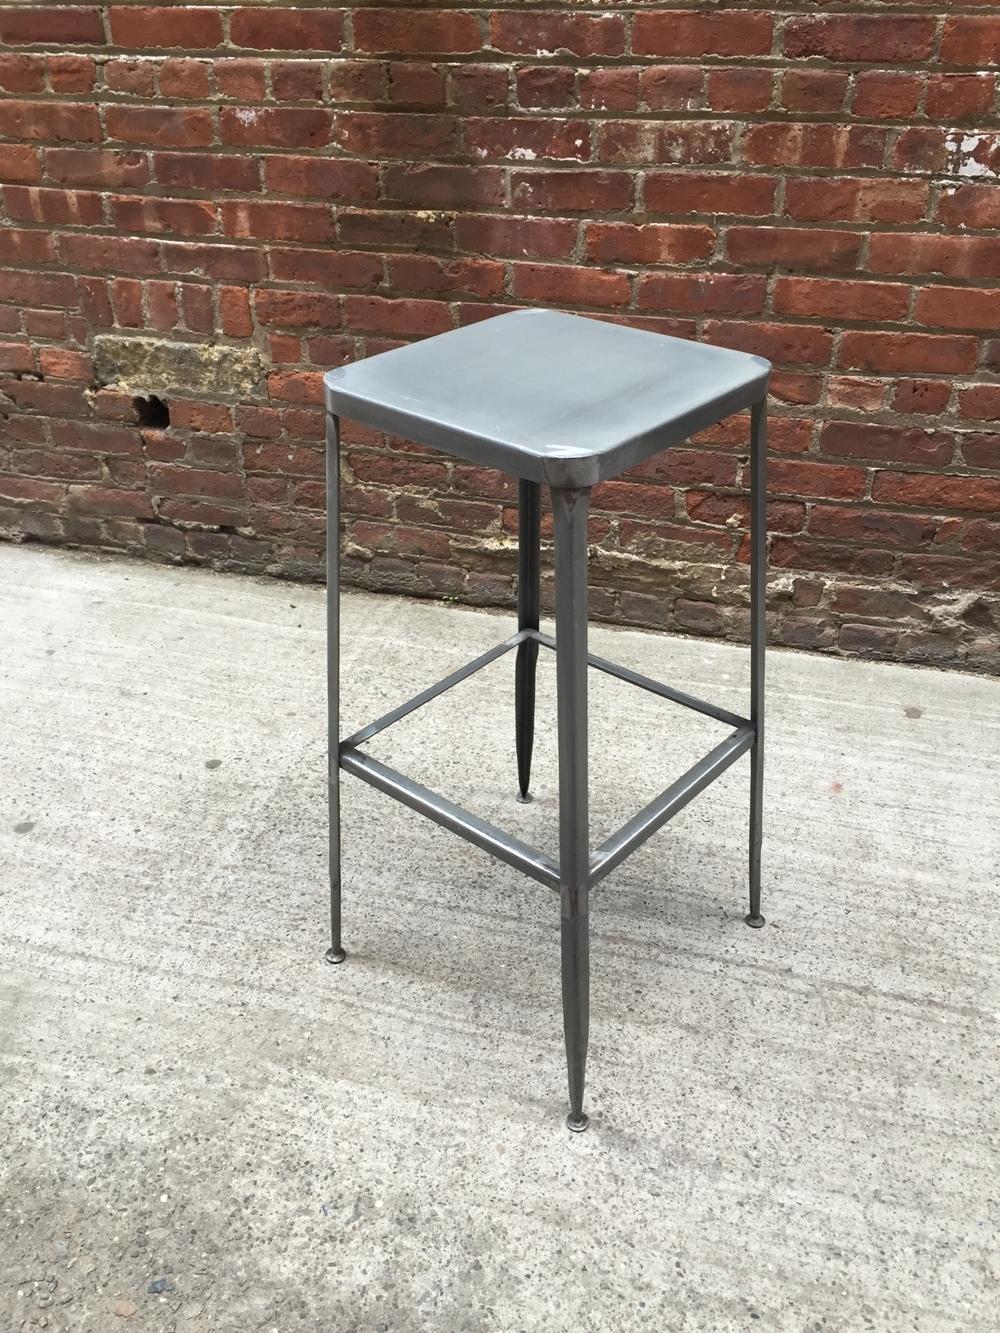 1896 work stool